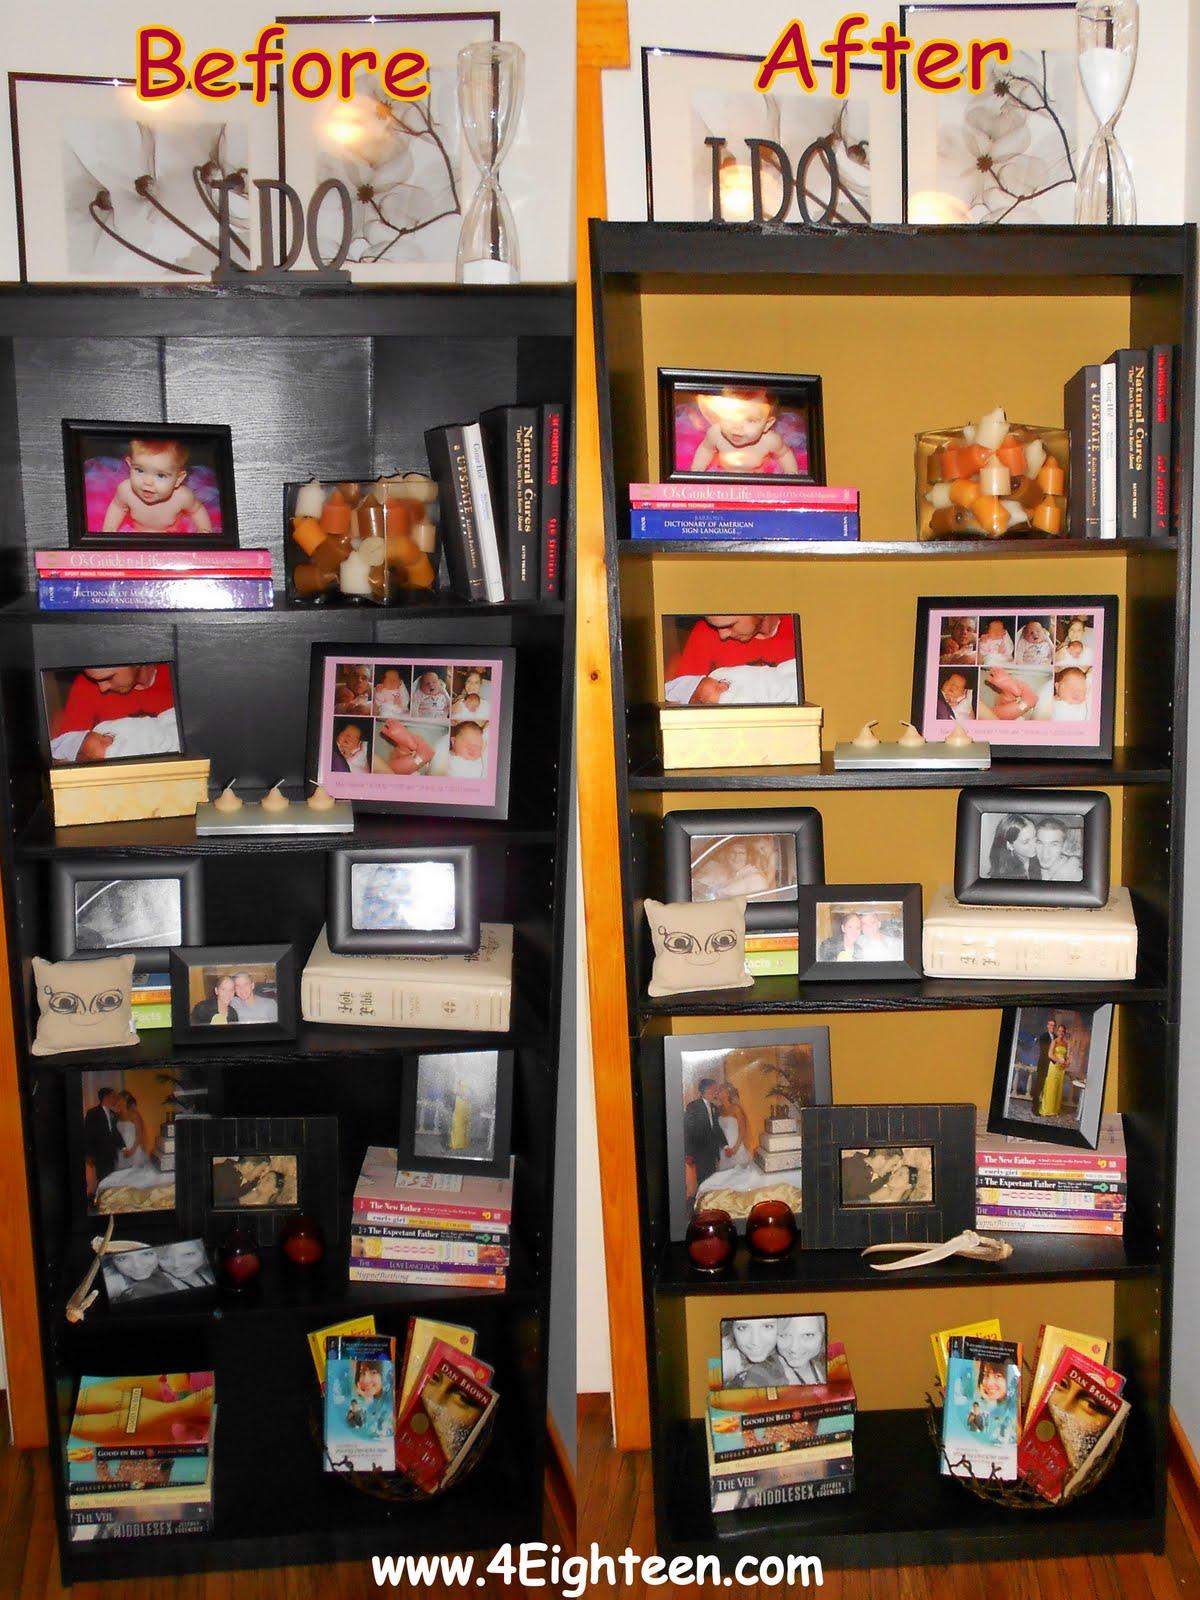 Fred Meyer Bookshelf 28 Images Fred Meyer Coupon Deals